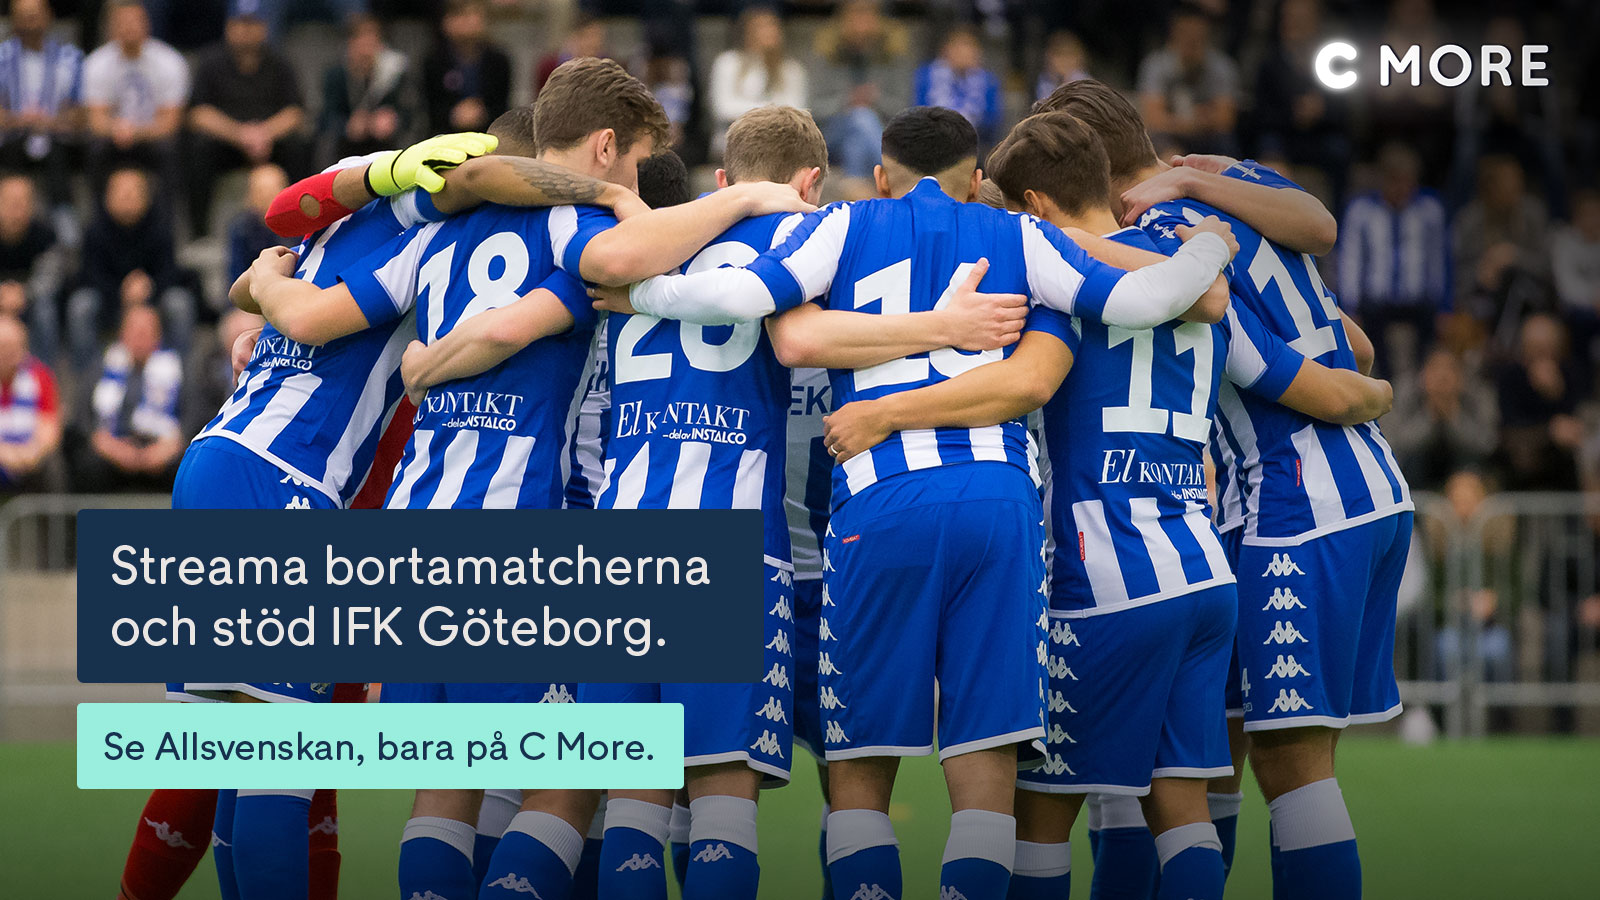 Se Matchen Pa C More Och Stod Ifk Ifk Goteborg Hela Stadens Lag